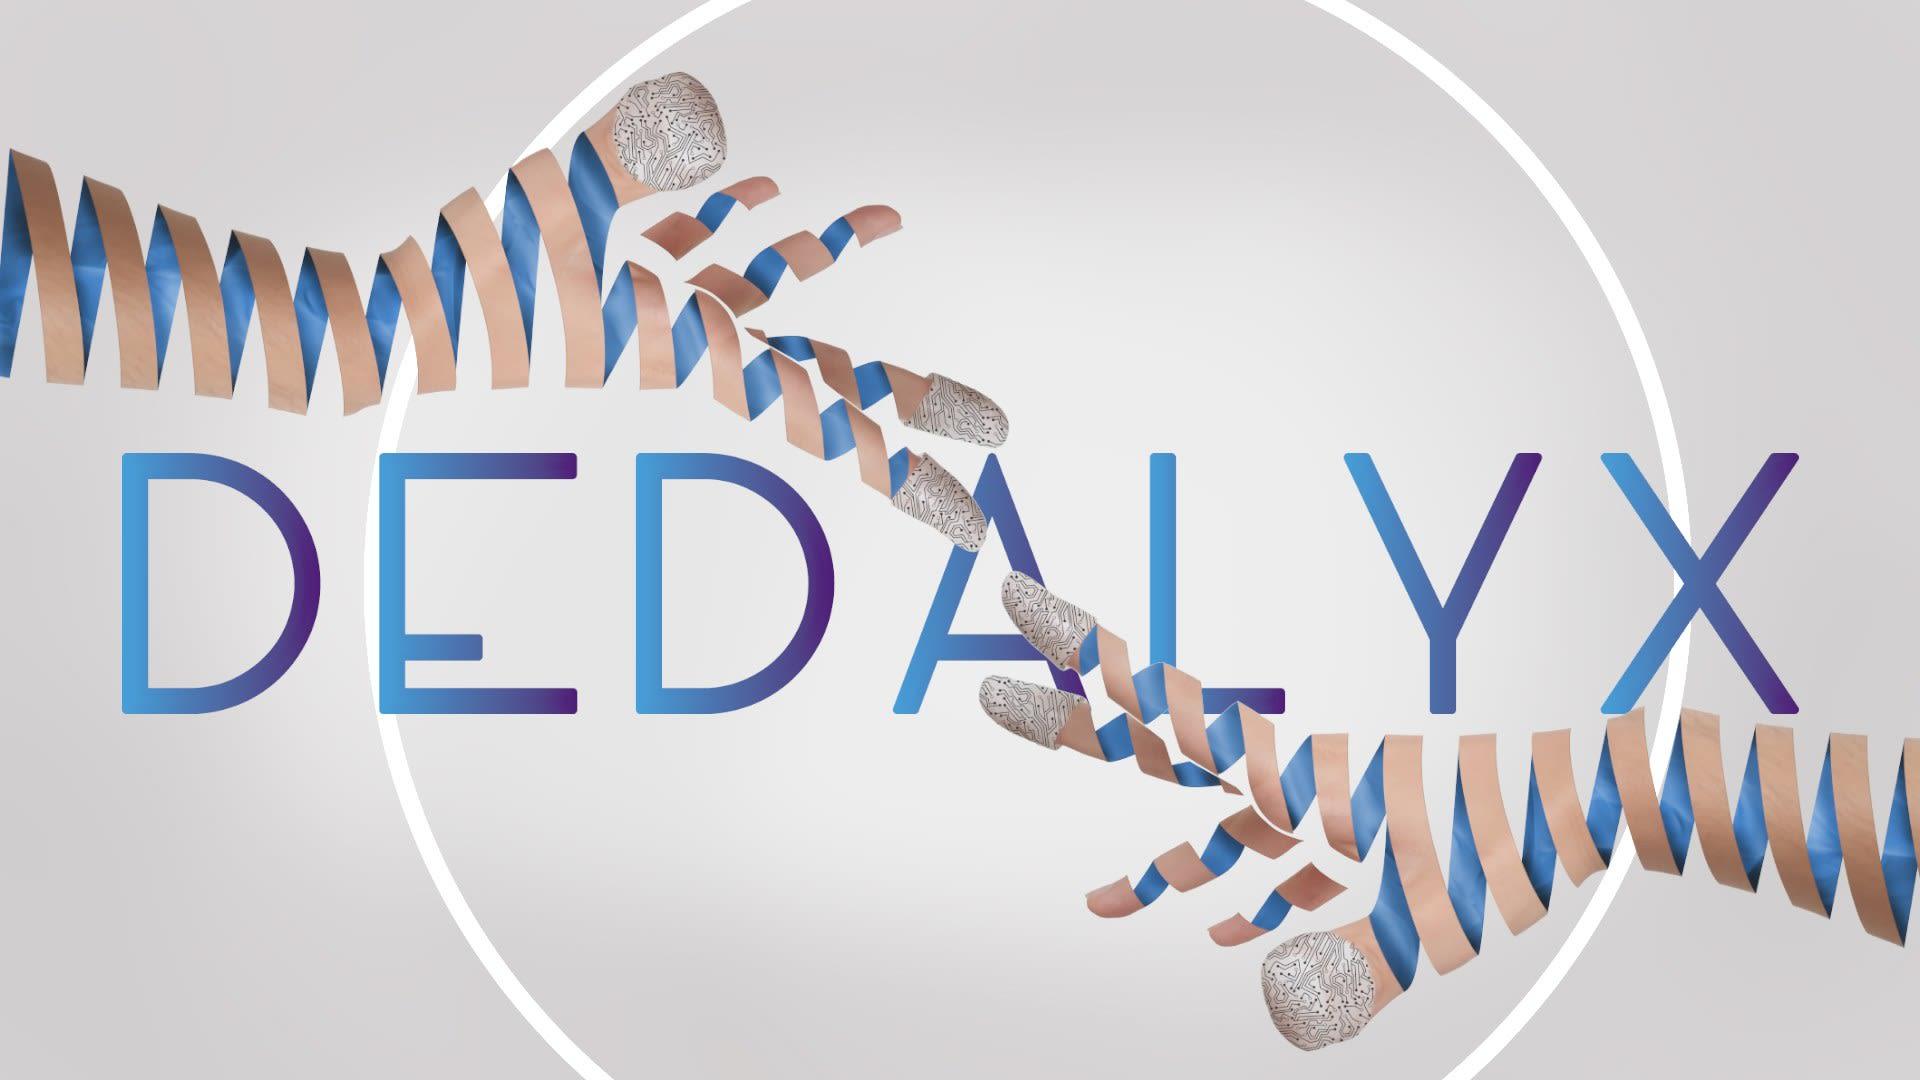 _Dedalyx presentation video